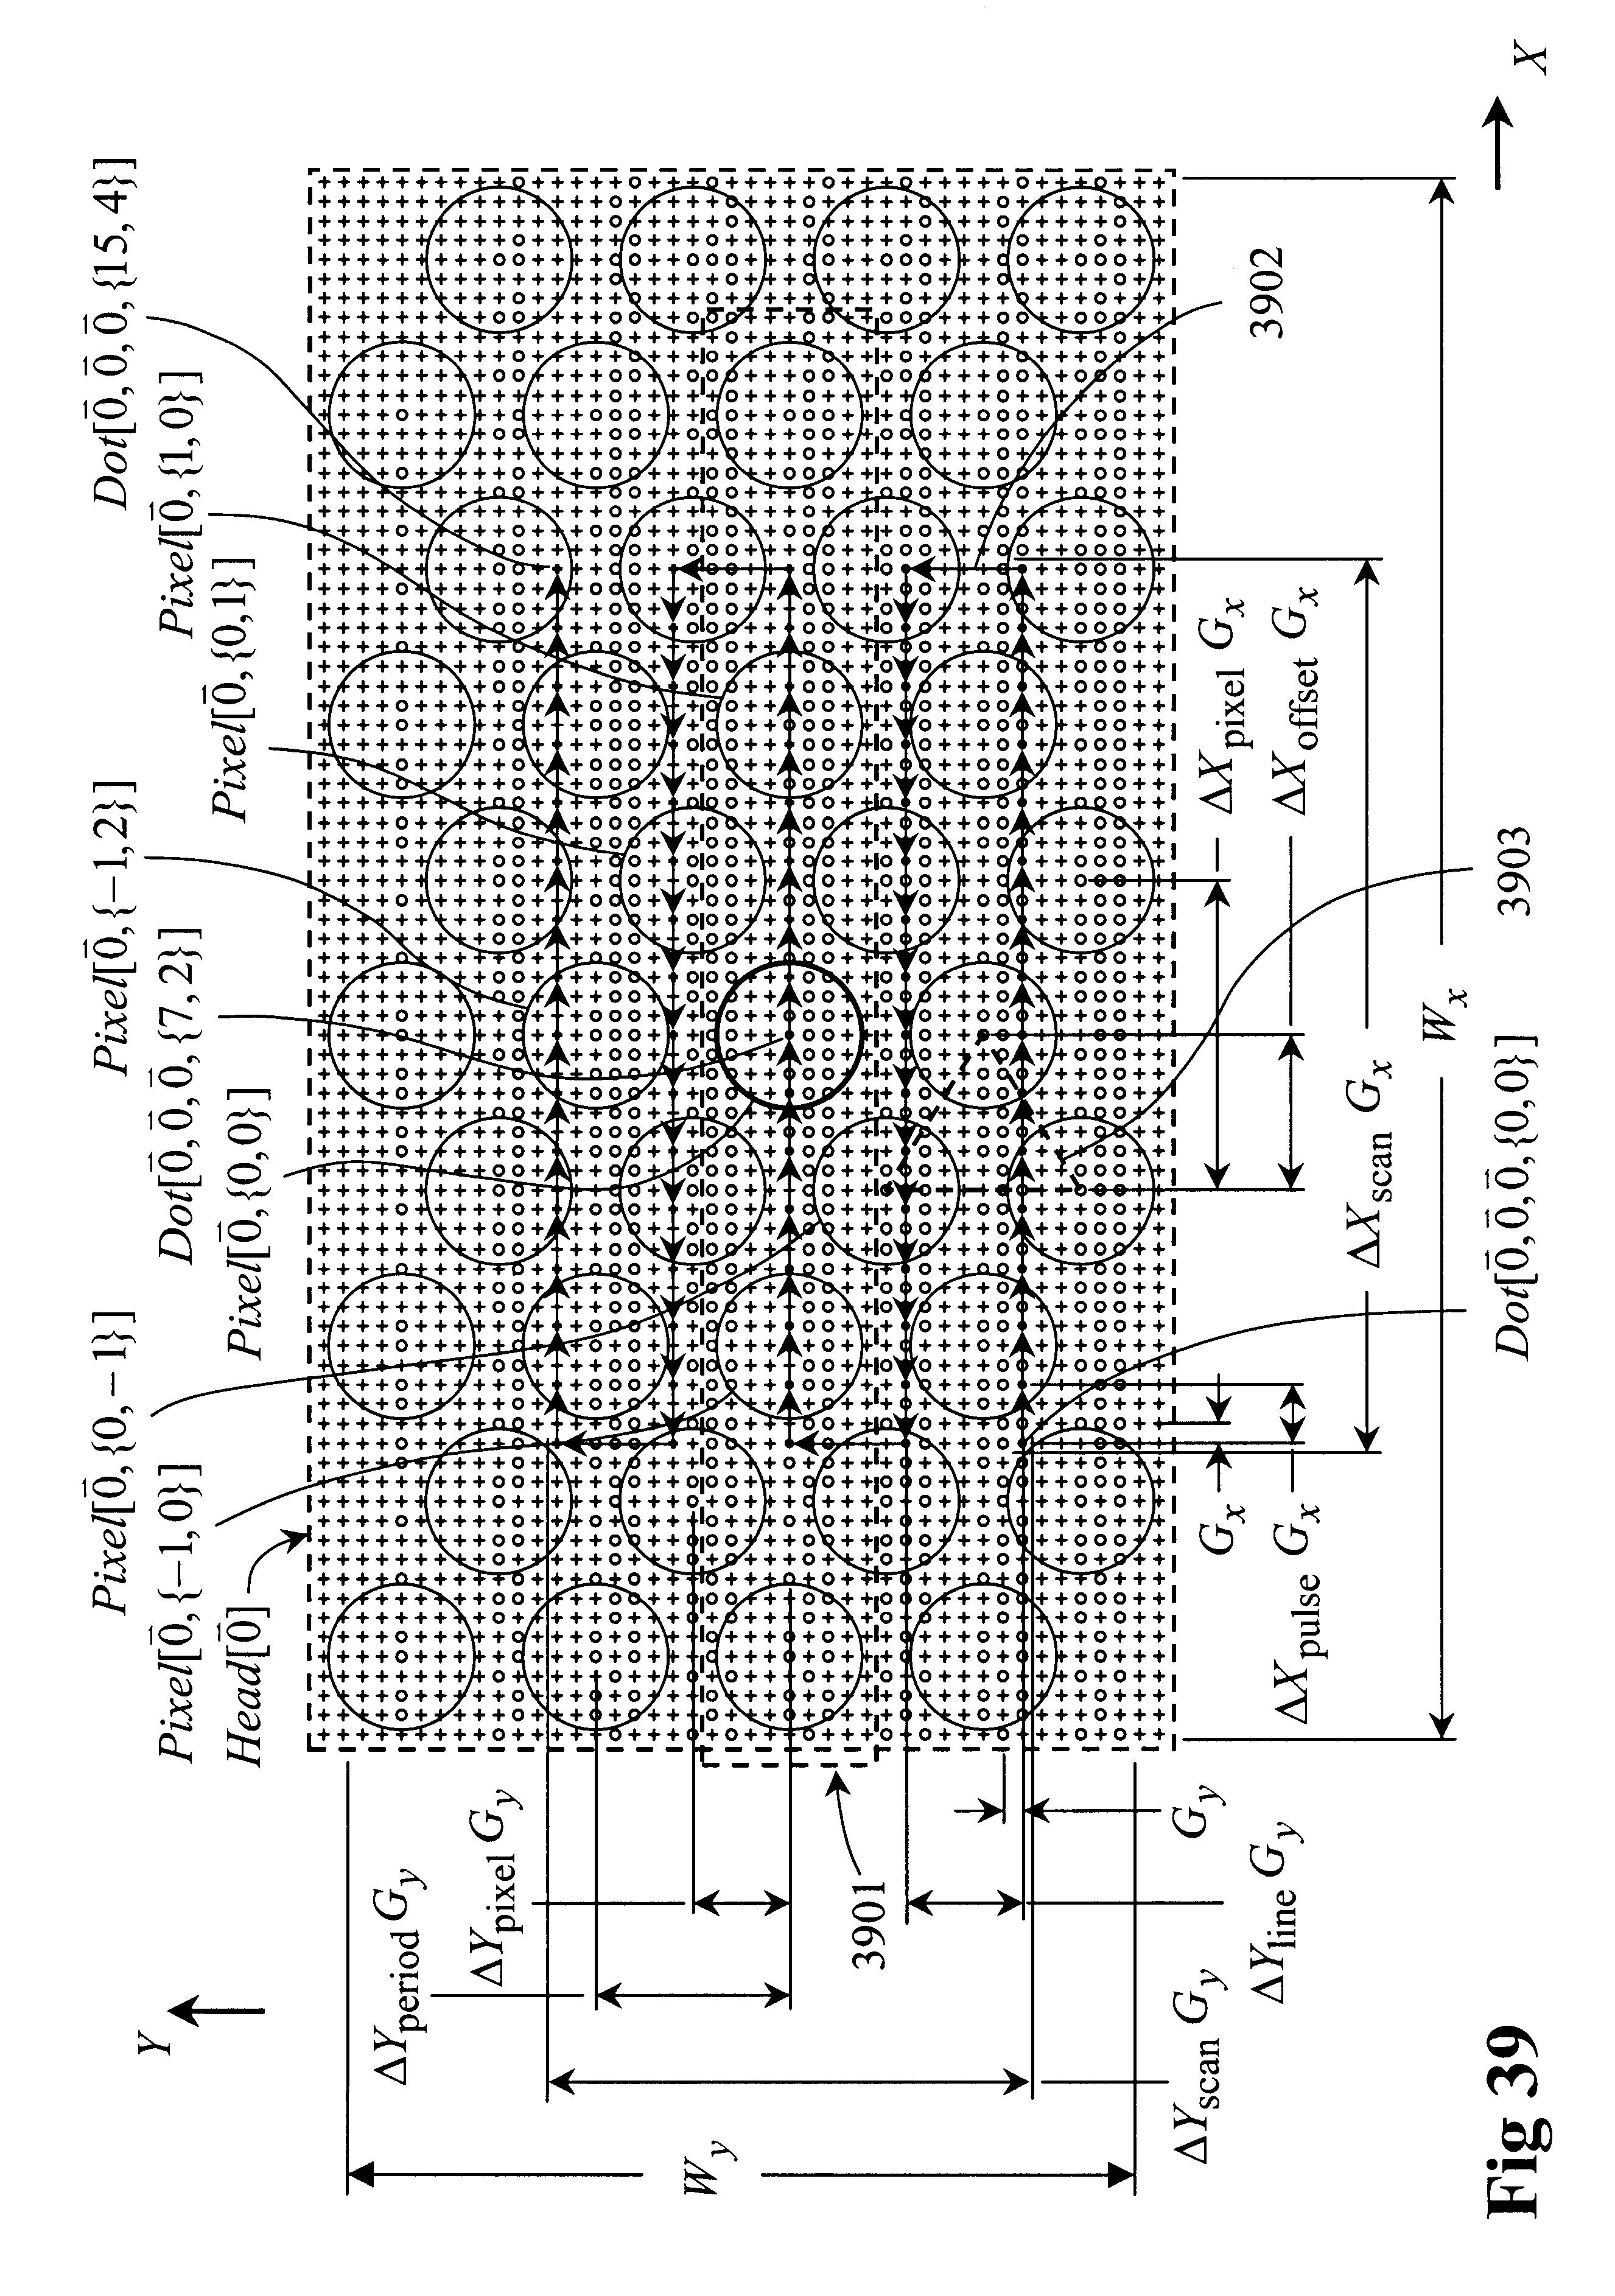 Rcs Actuator Wiring Diagram View Diagram